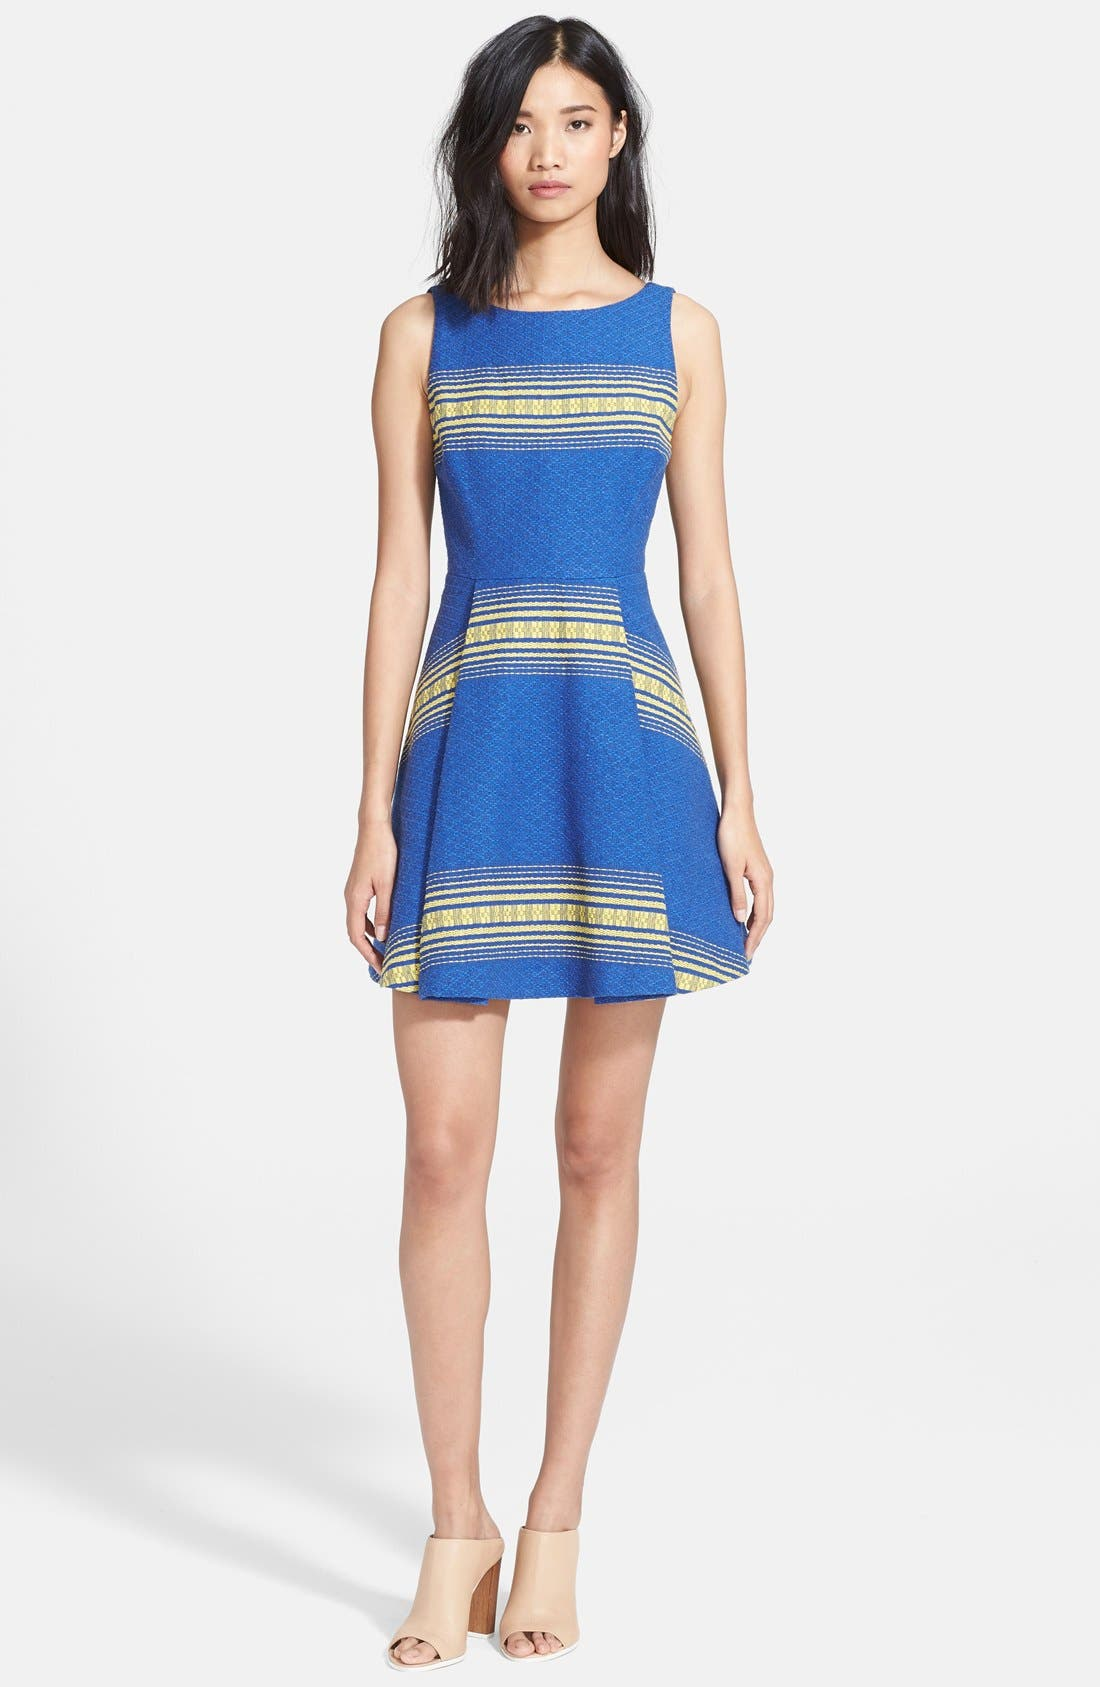 Main Image - Alice + Olivia 'Holis' Cotton Fit & Flare Dress